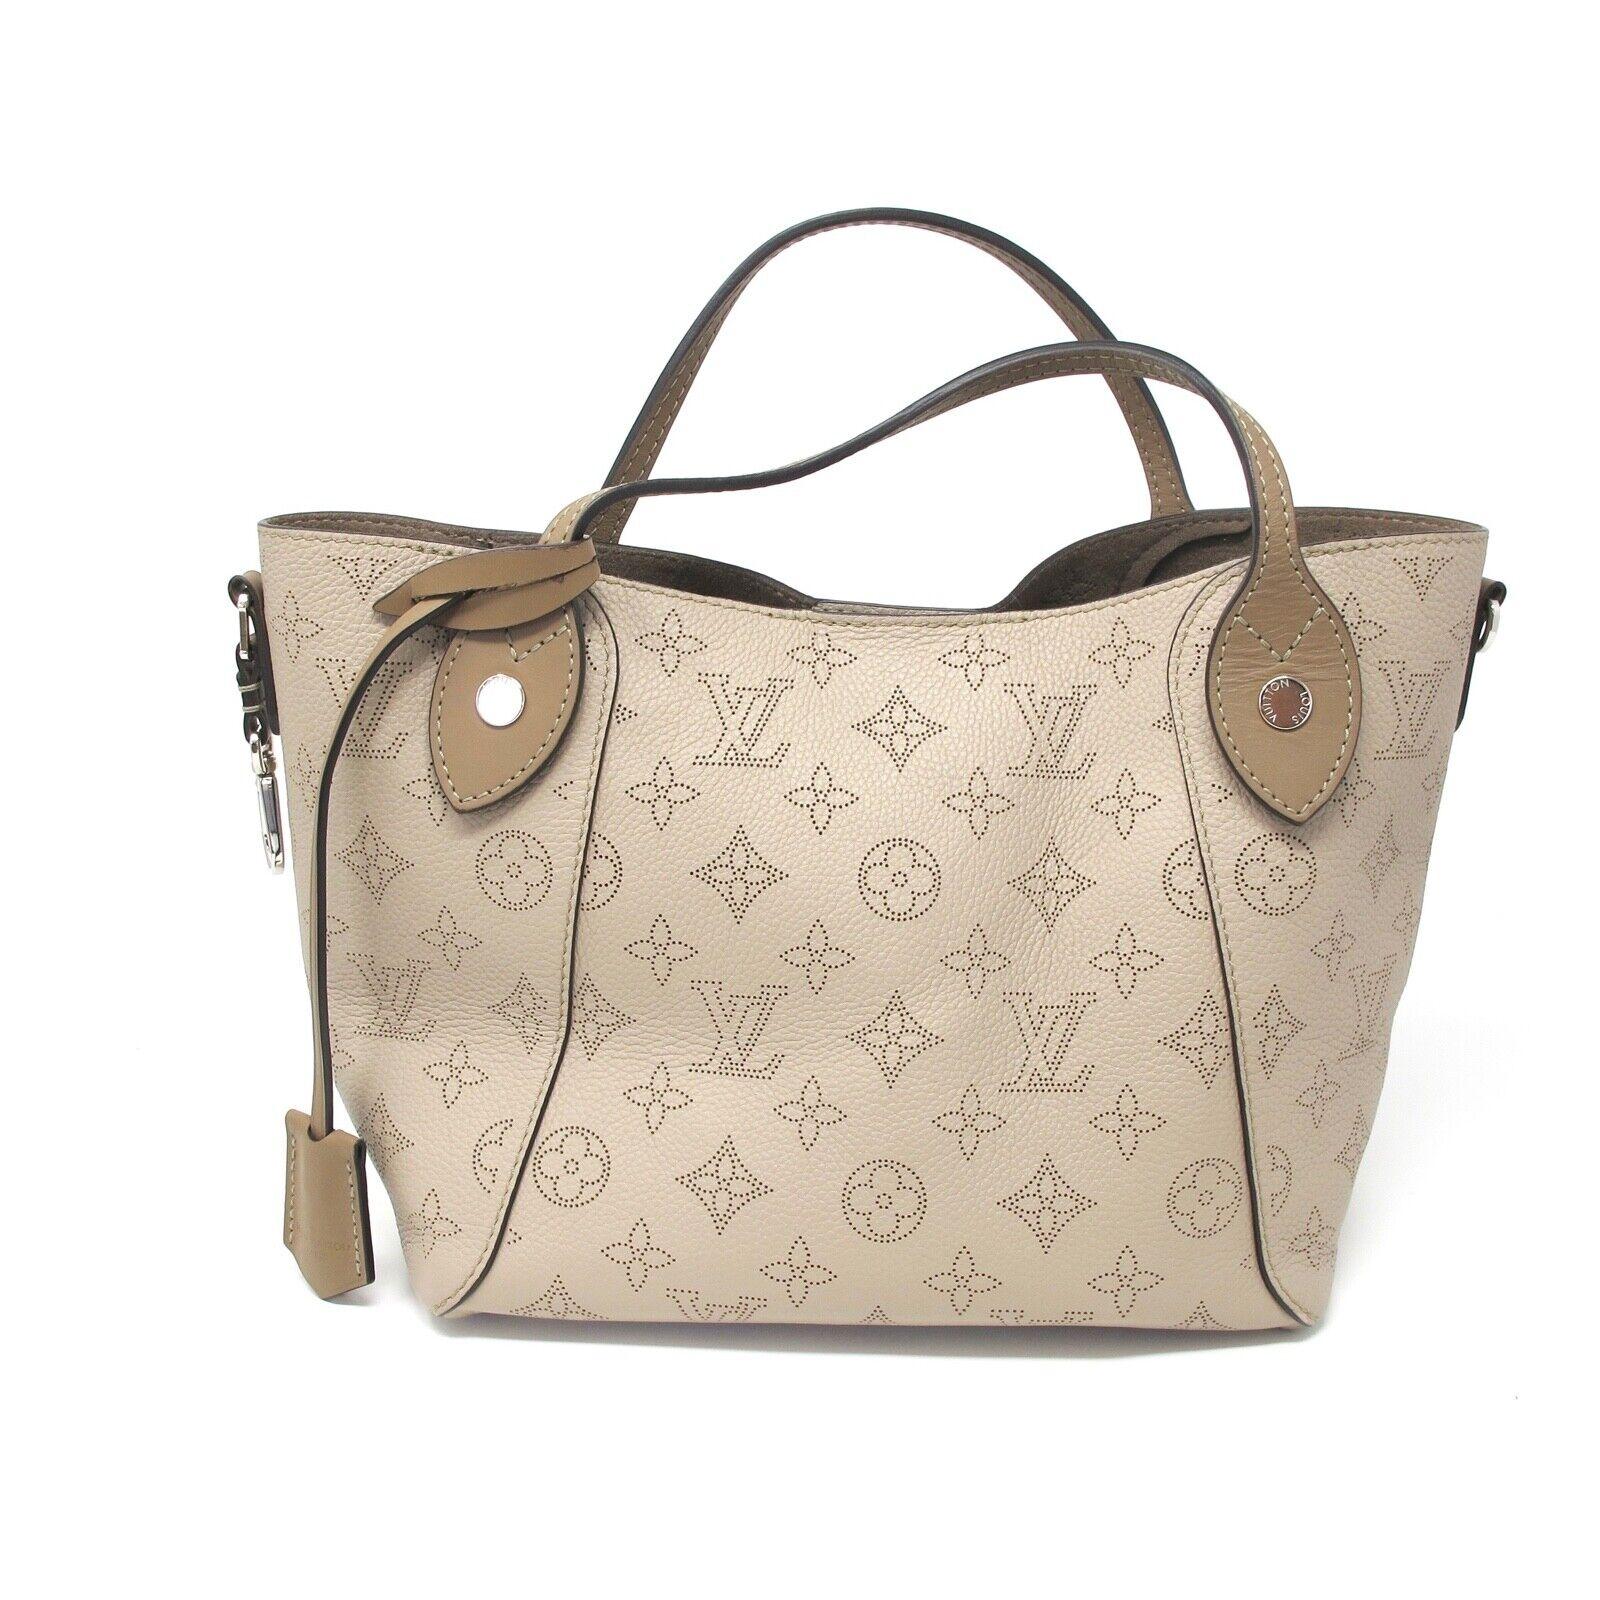 Louis Vuitton Haumea Mahina Galet Handbag For Sale Online Ebay